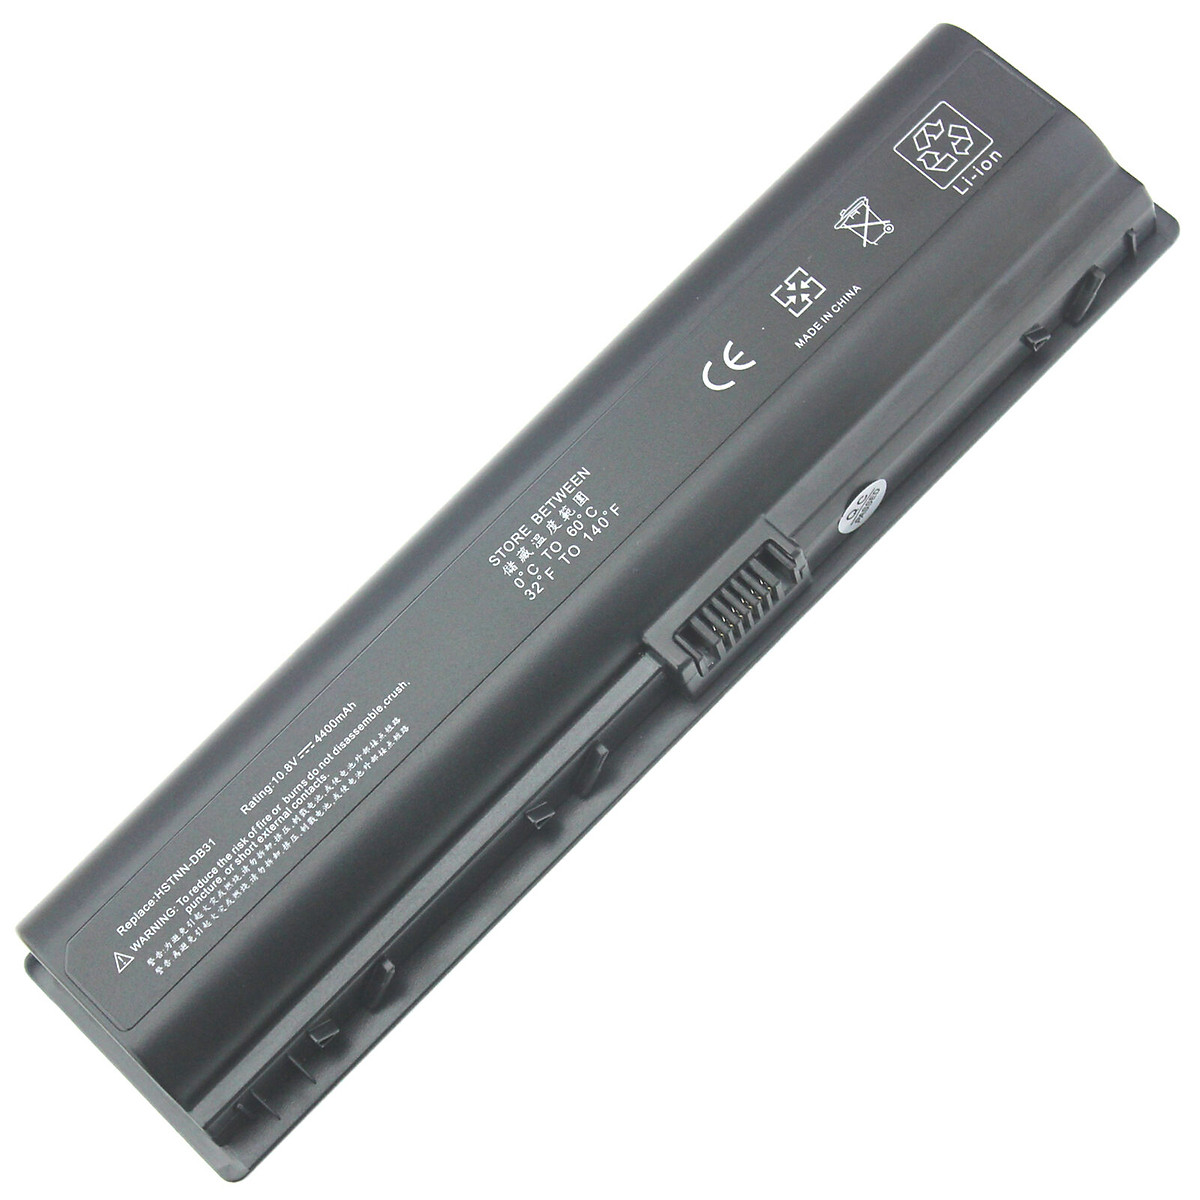 Pin dành cho Laptop HP Pavilion DV6700